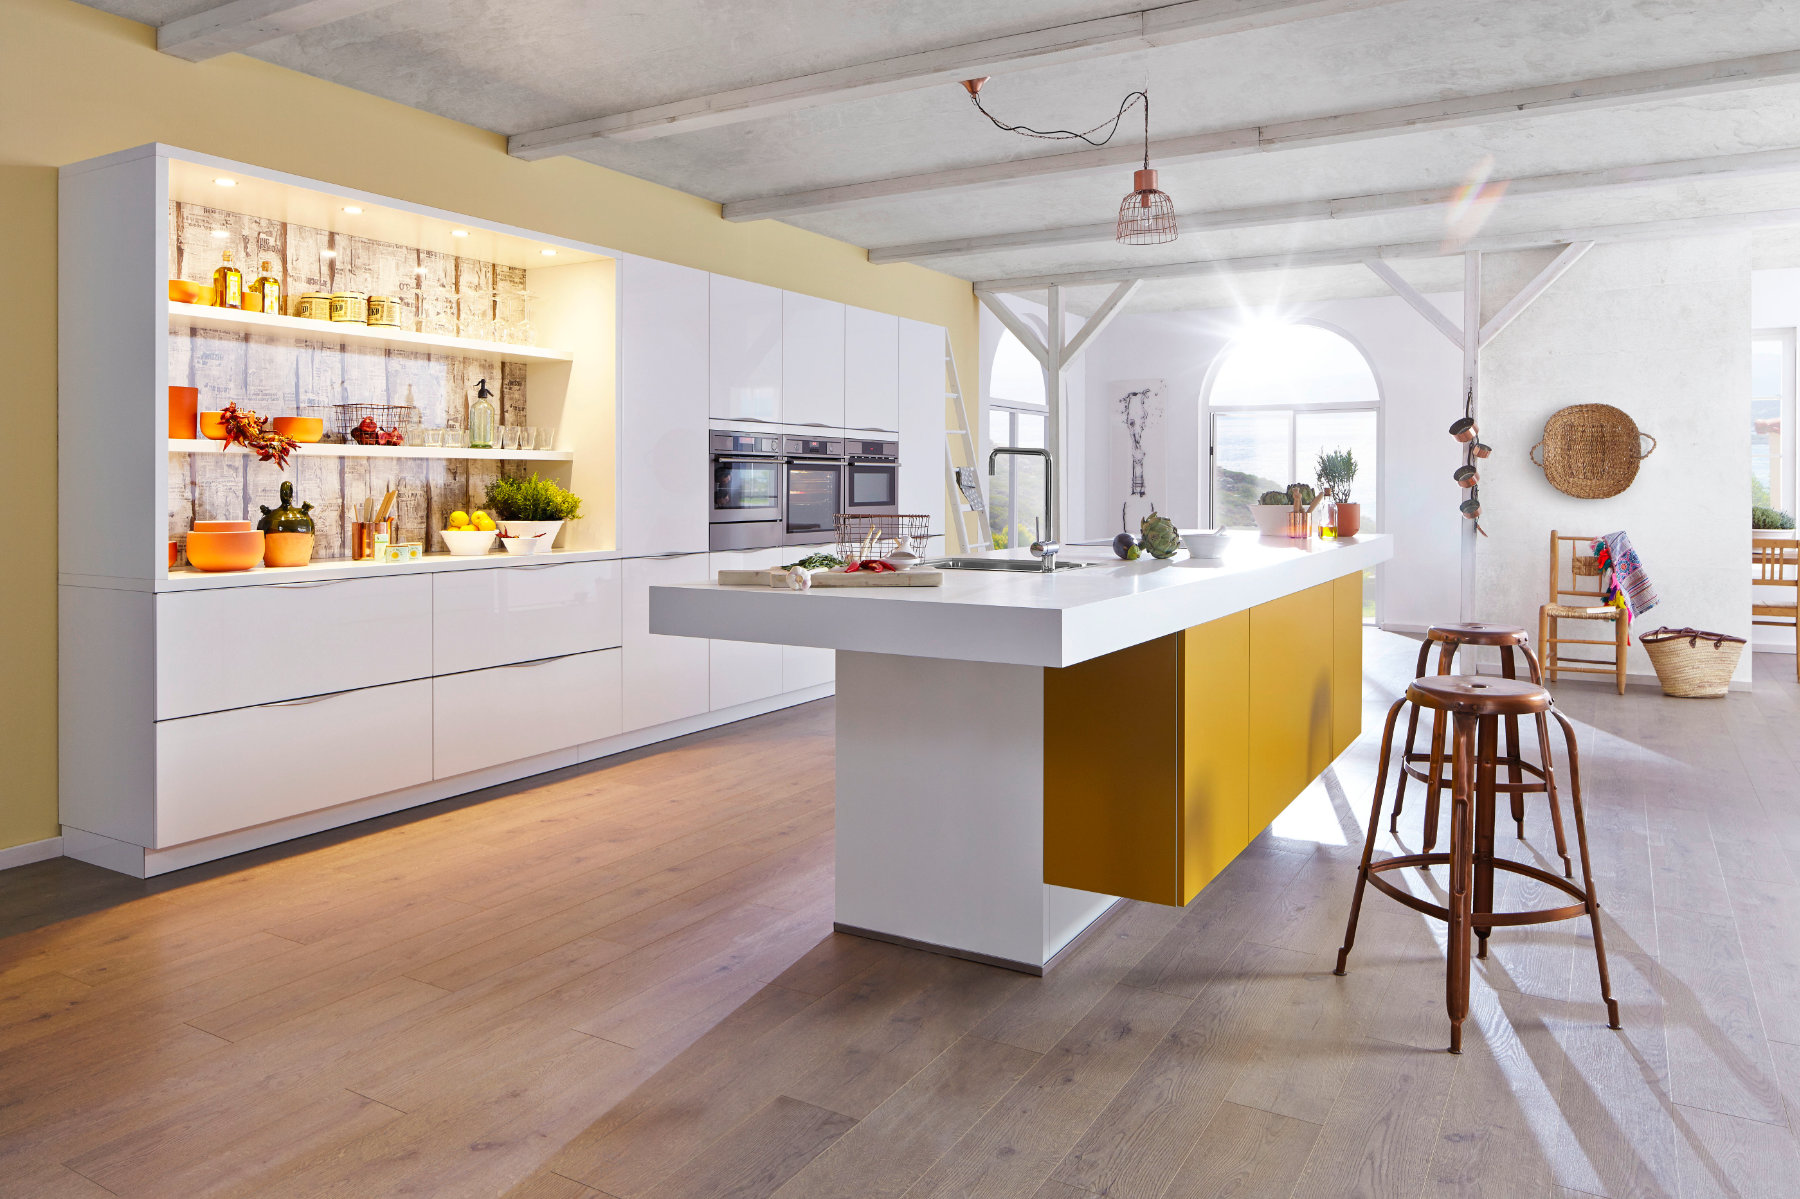 Bauformat White Gloss Mustard Open Plan Kitchen With Island 2 | MHK Kitchen Experts